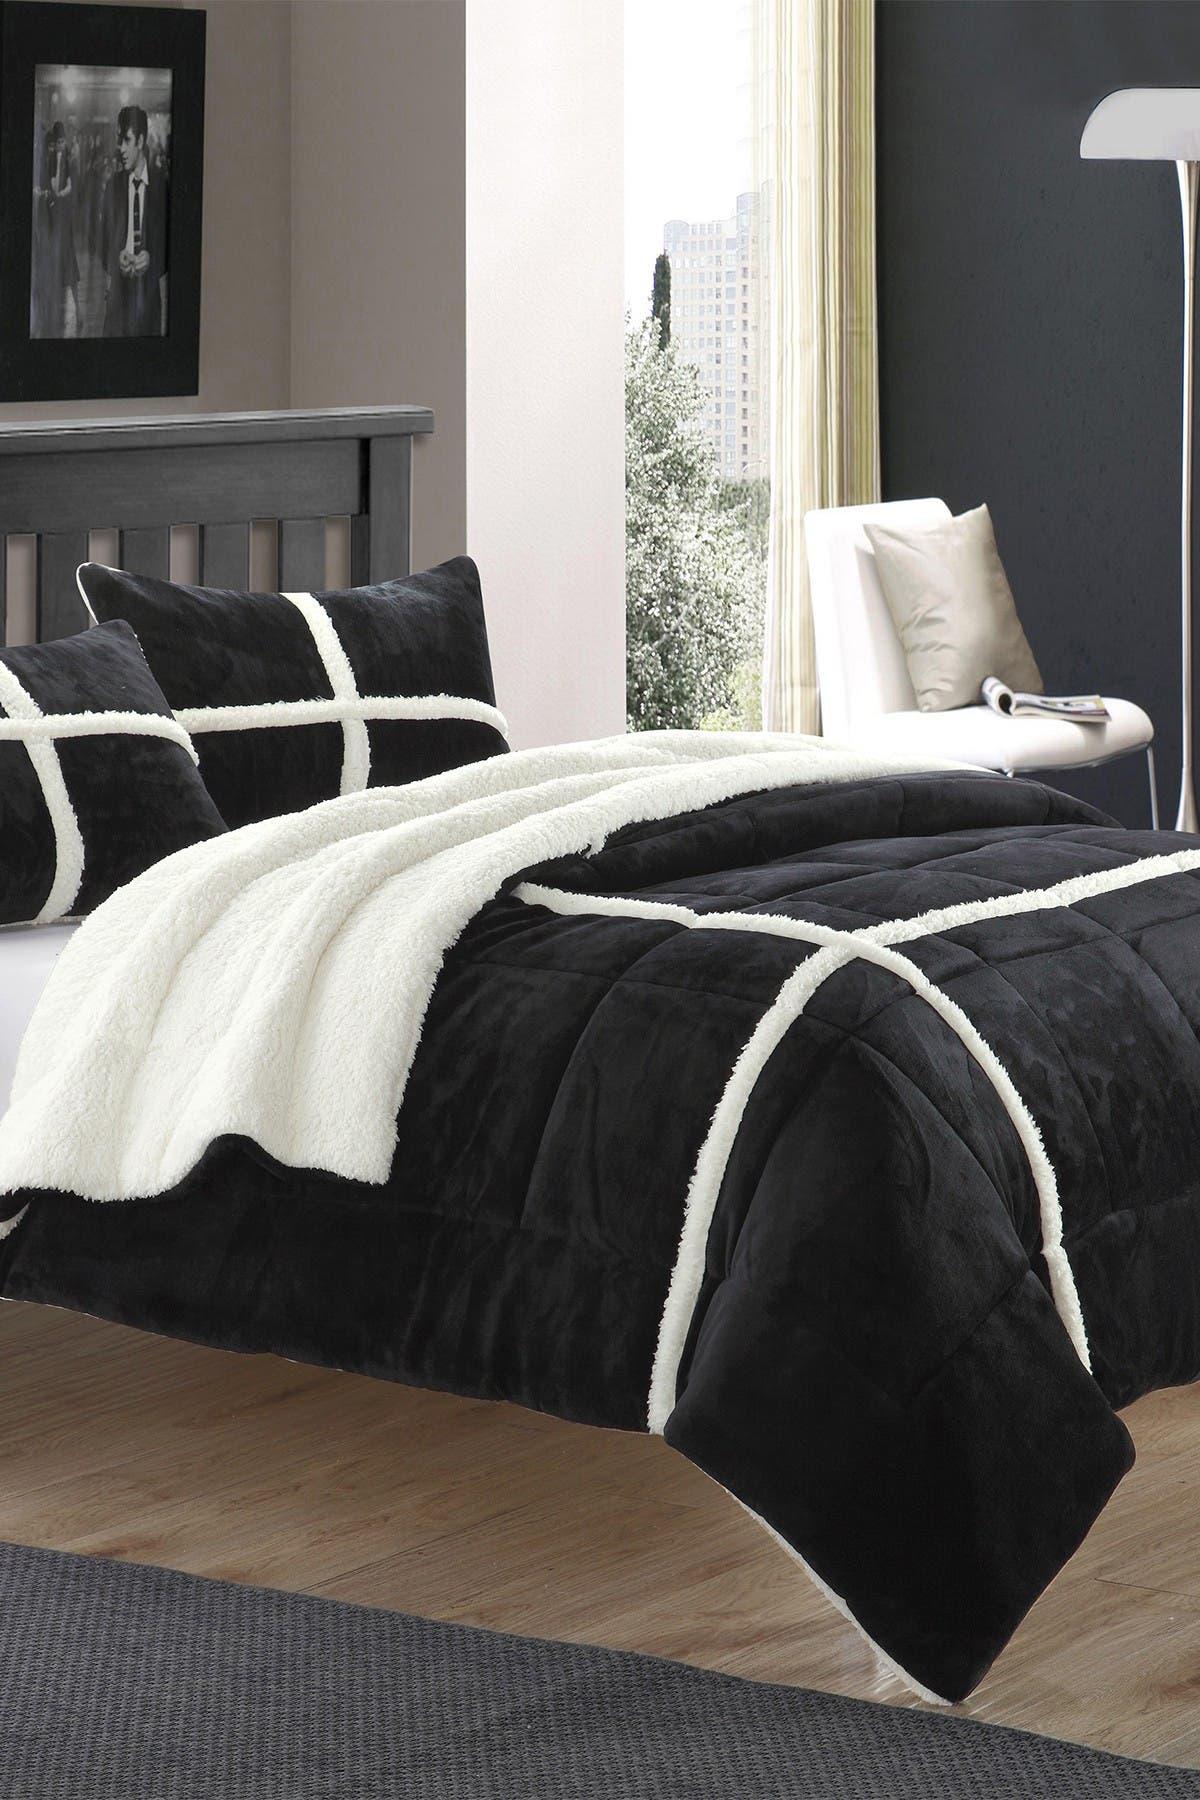 Chic Home Bedding King Camille Box Sherling Lined Comforter Set Black Nordstrom Rack